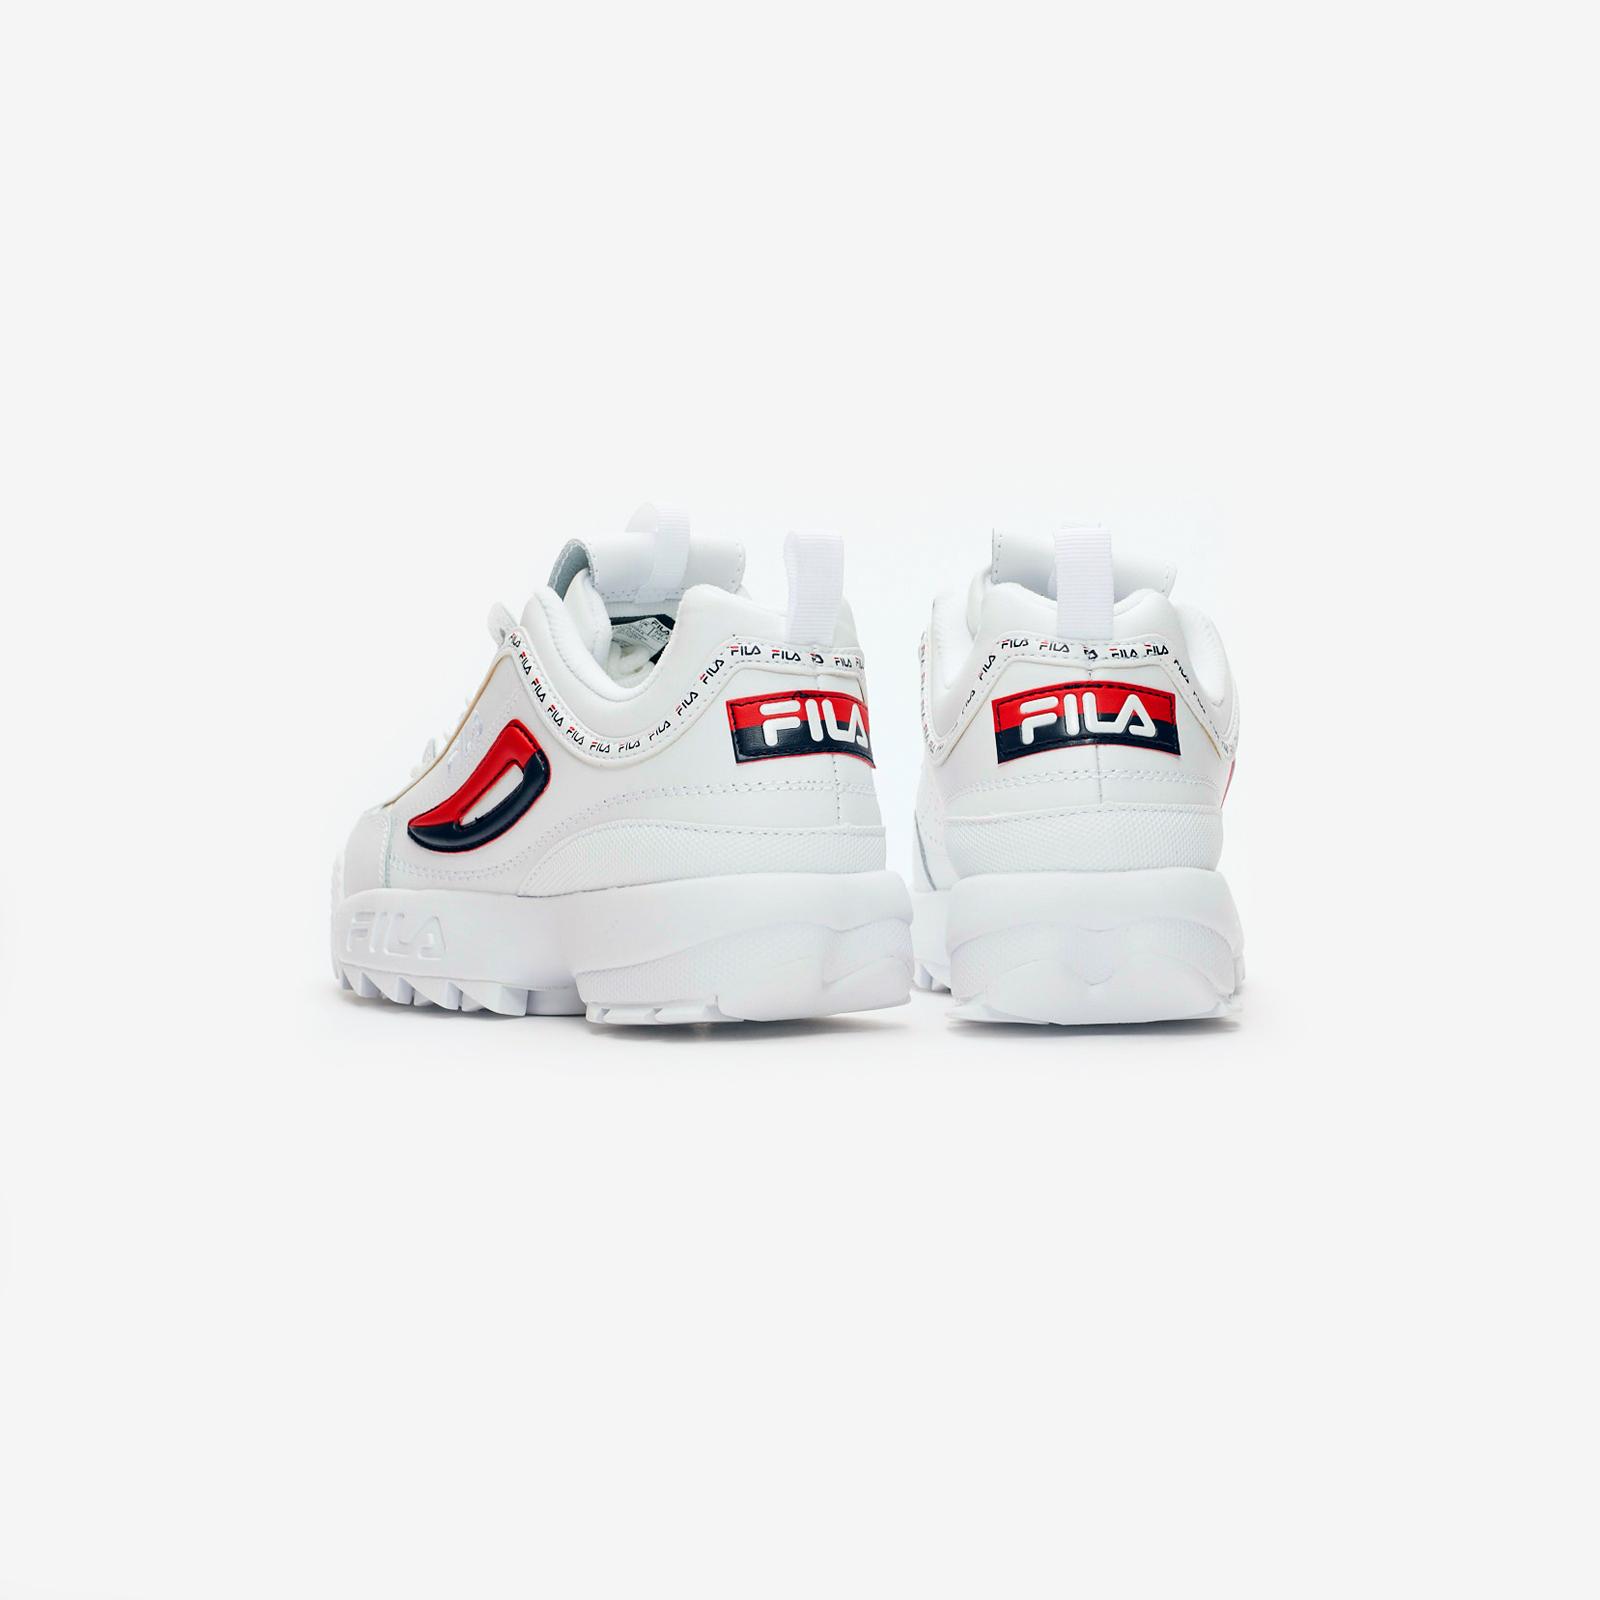 7fa2399652a Fila Disruptor II Premium Repeat - 5fm00079-125 - Sneakersnstuff ...